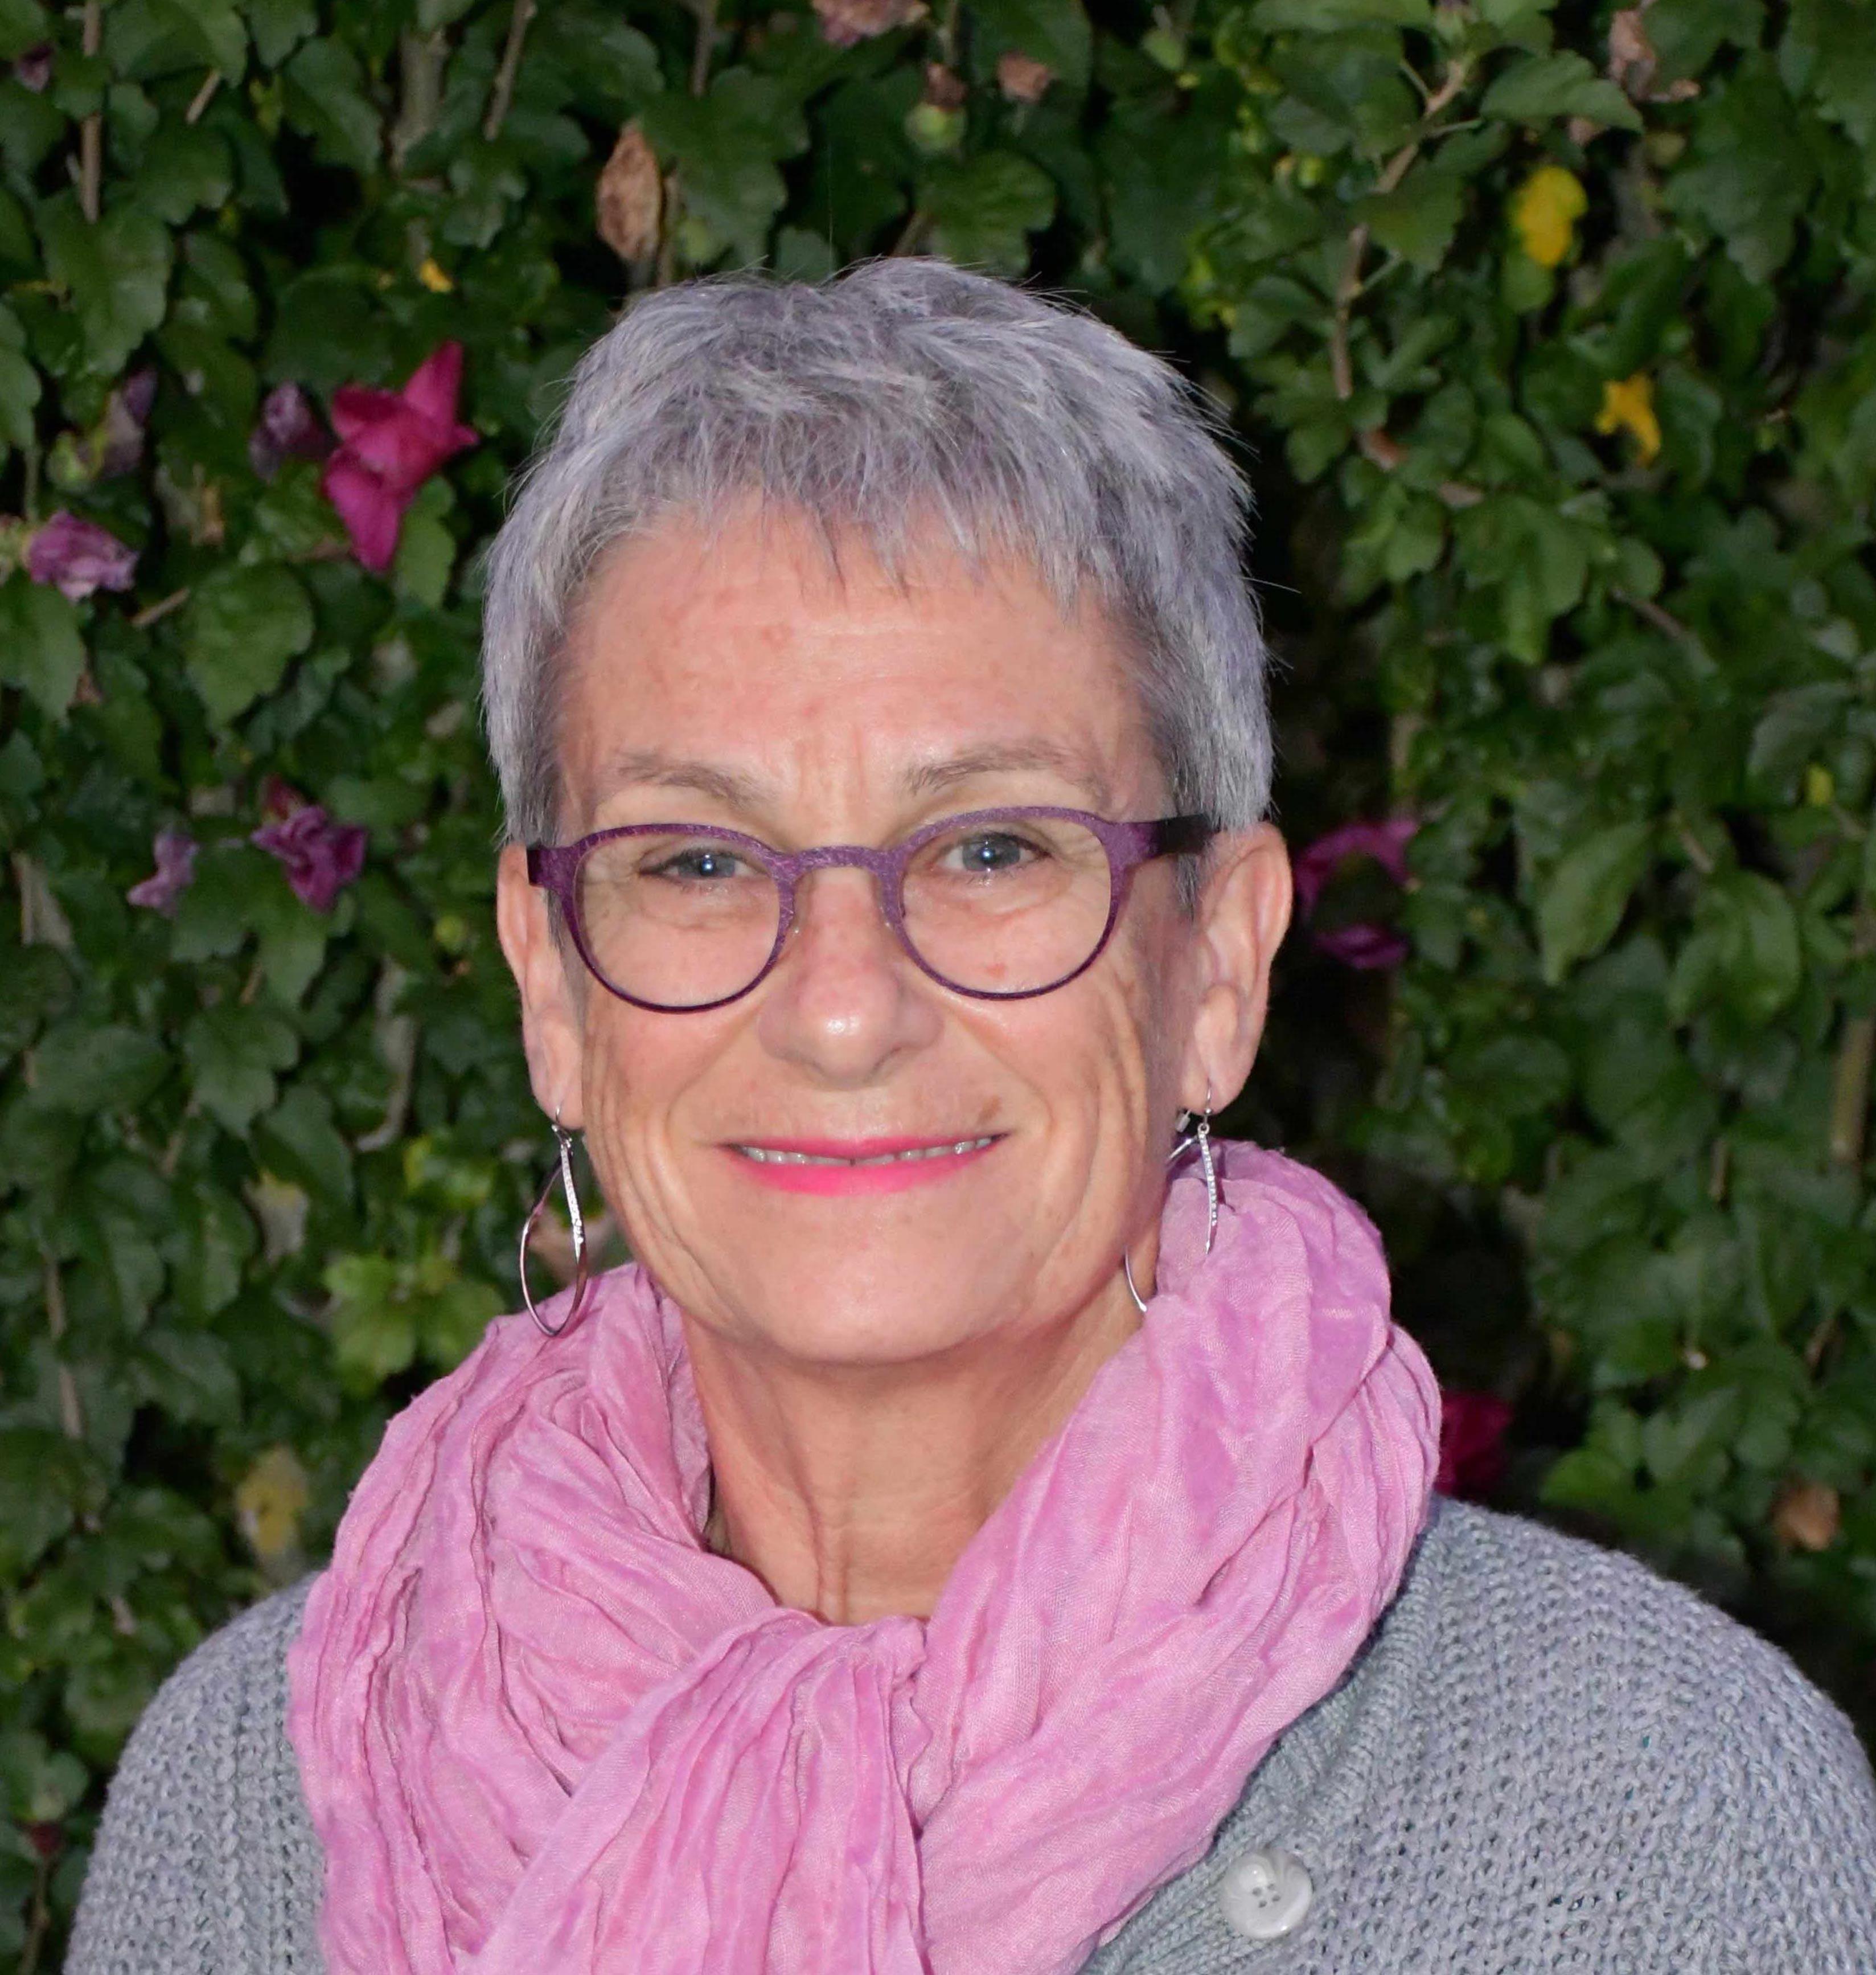 Marianne Métral